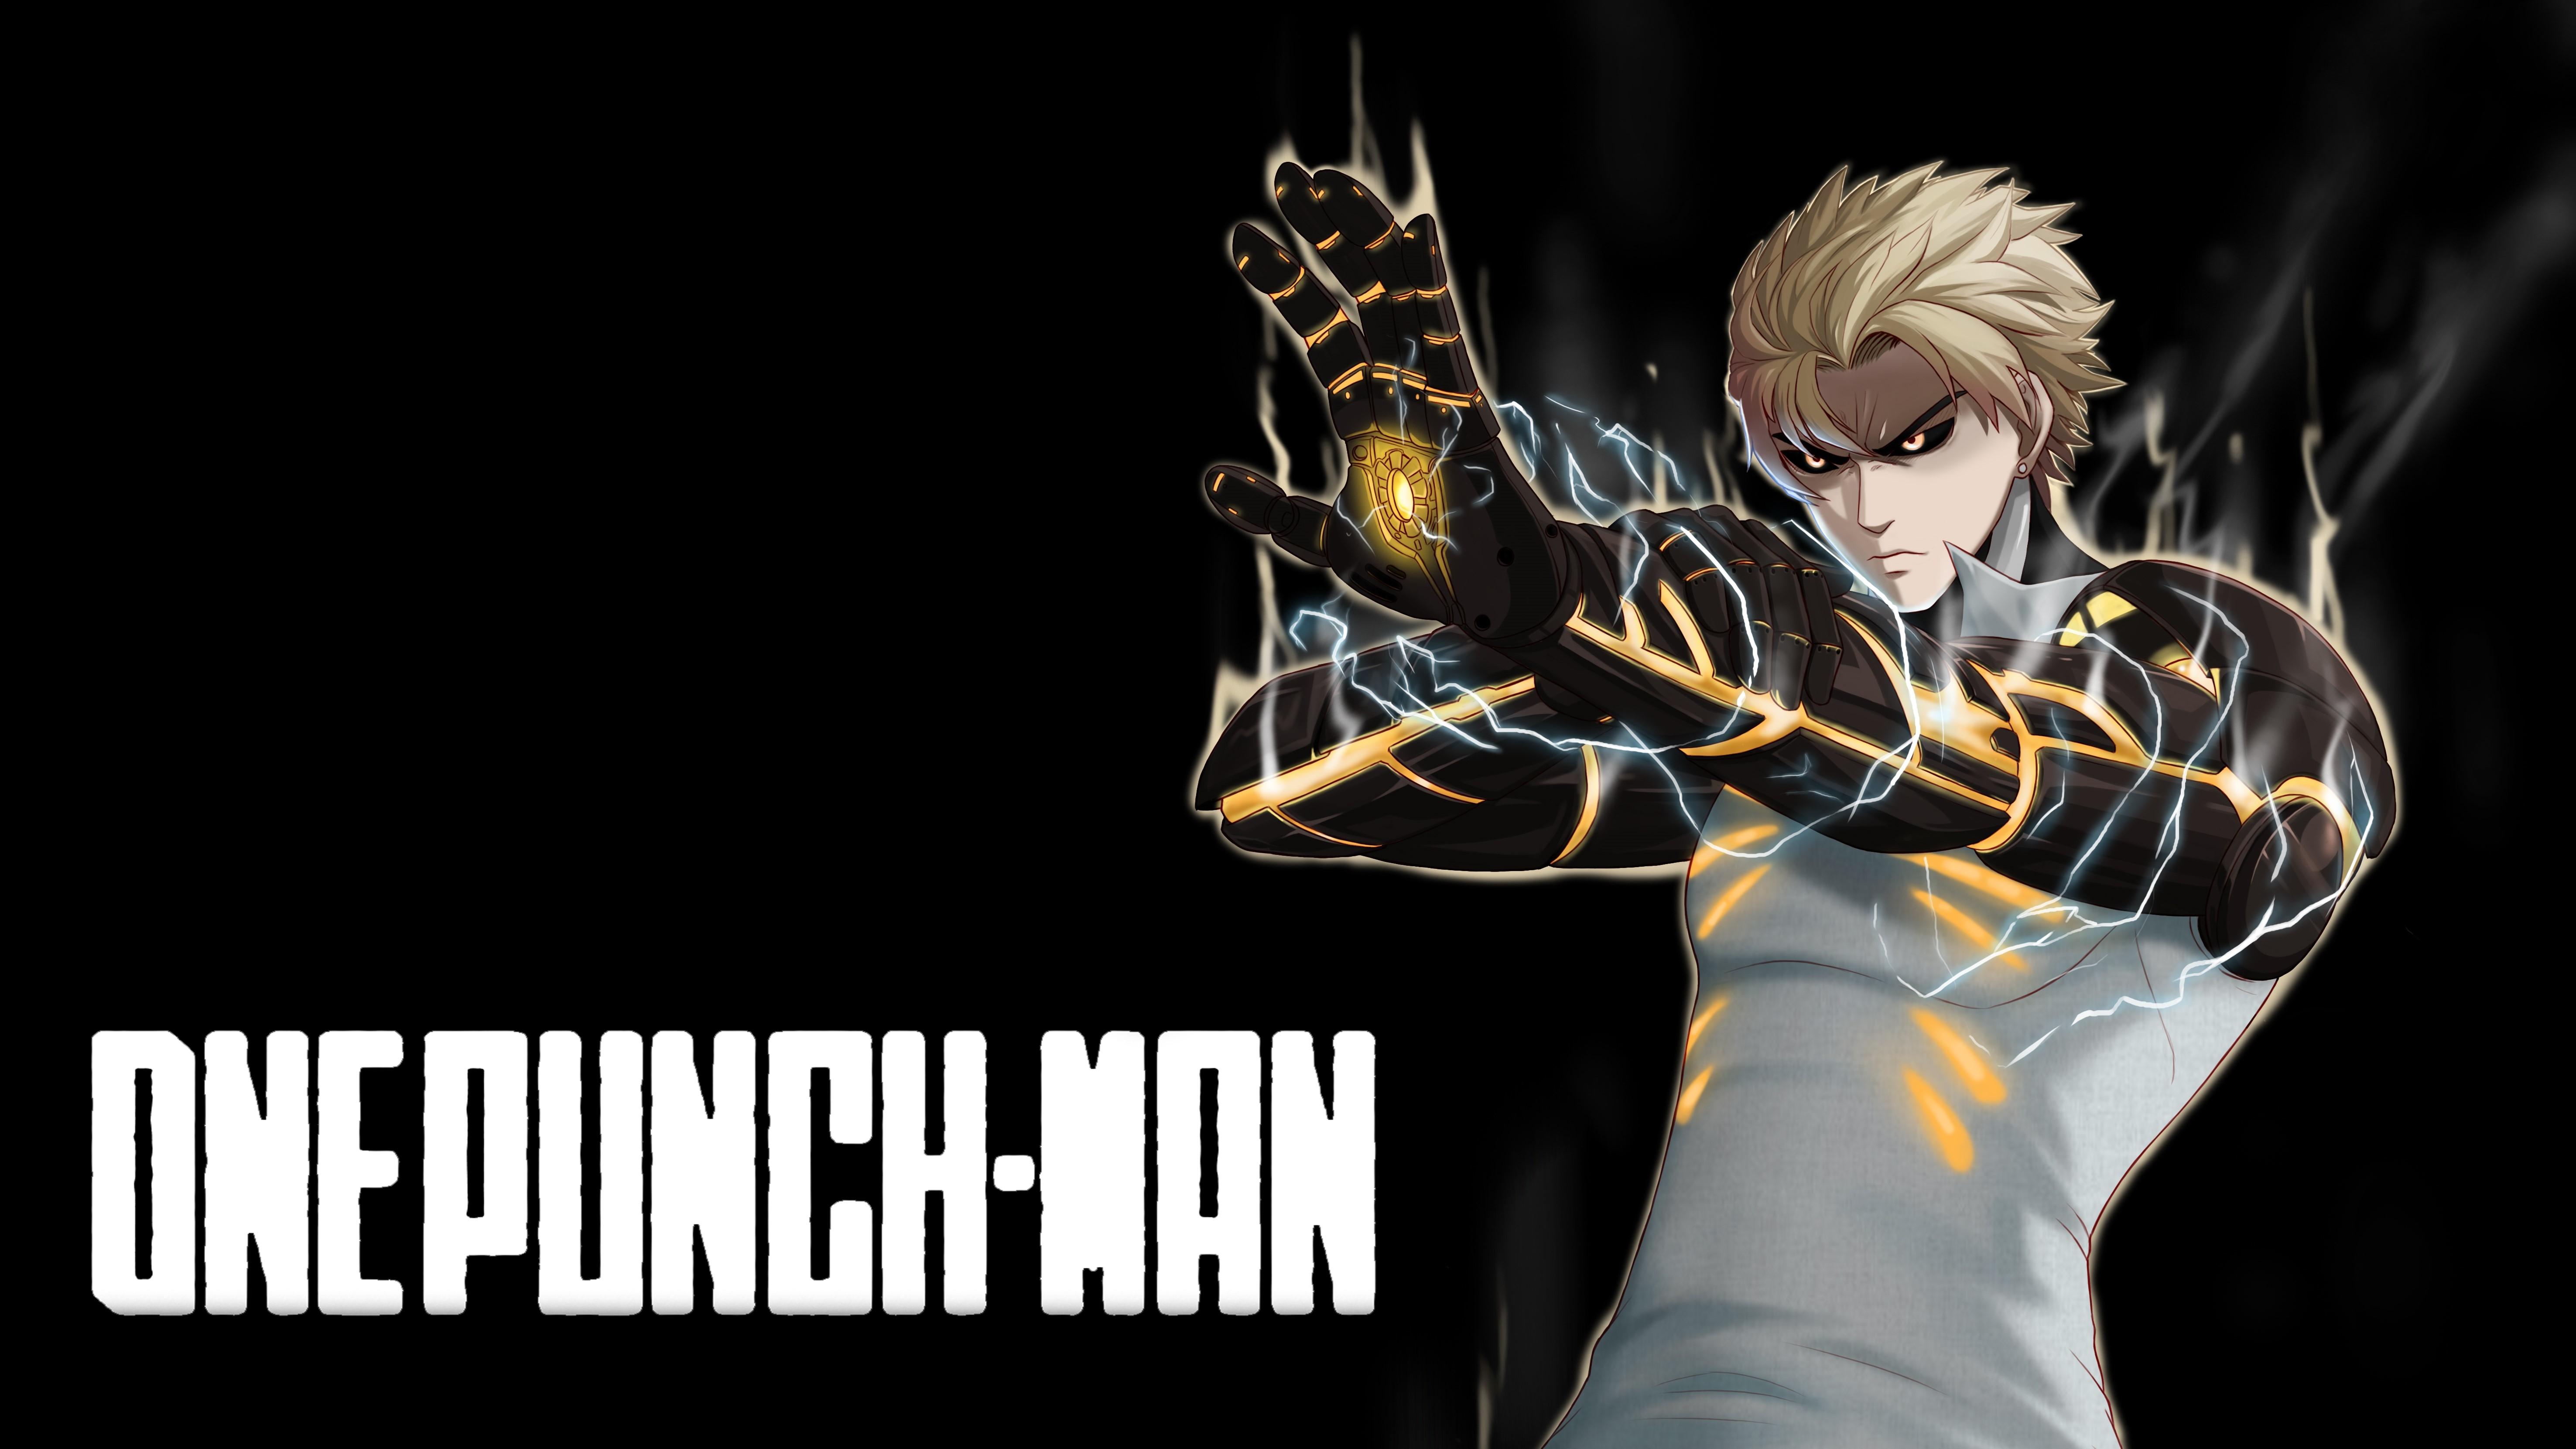 Genos One Punch Man Wallpaper Hd Anime 4k Wallpapers